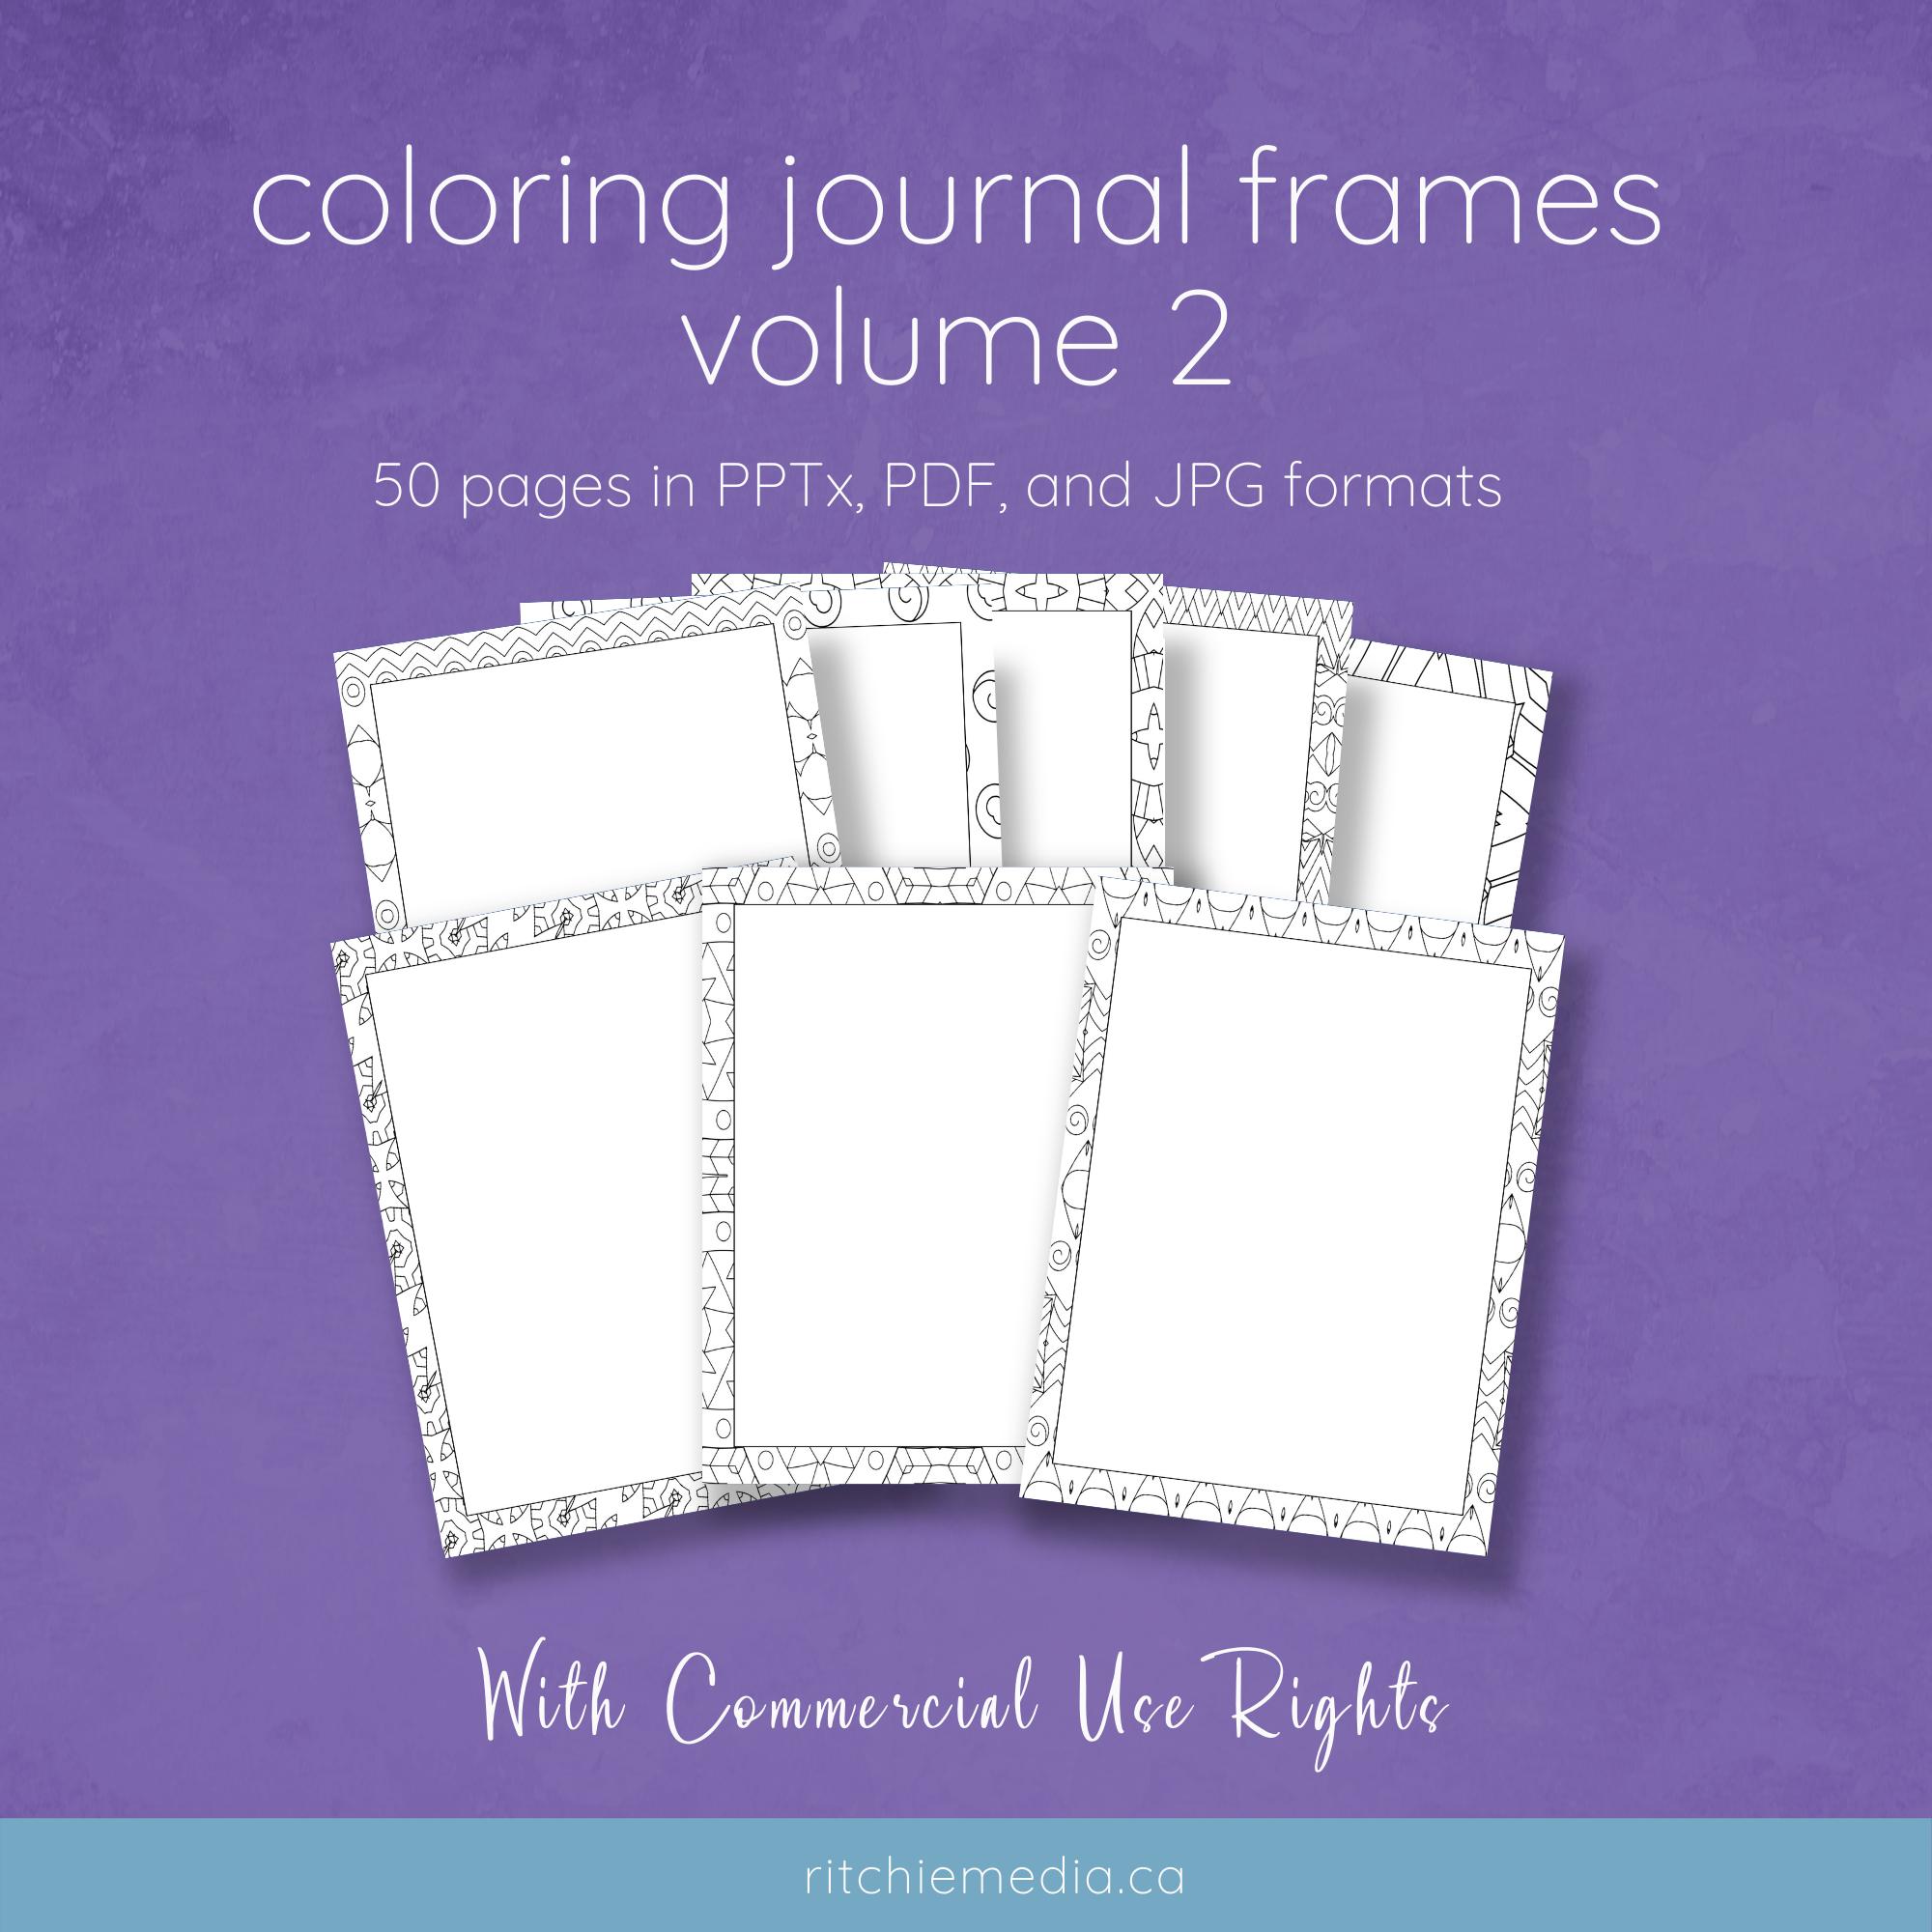 coloring journals vol 2 mockup